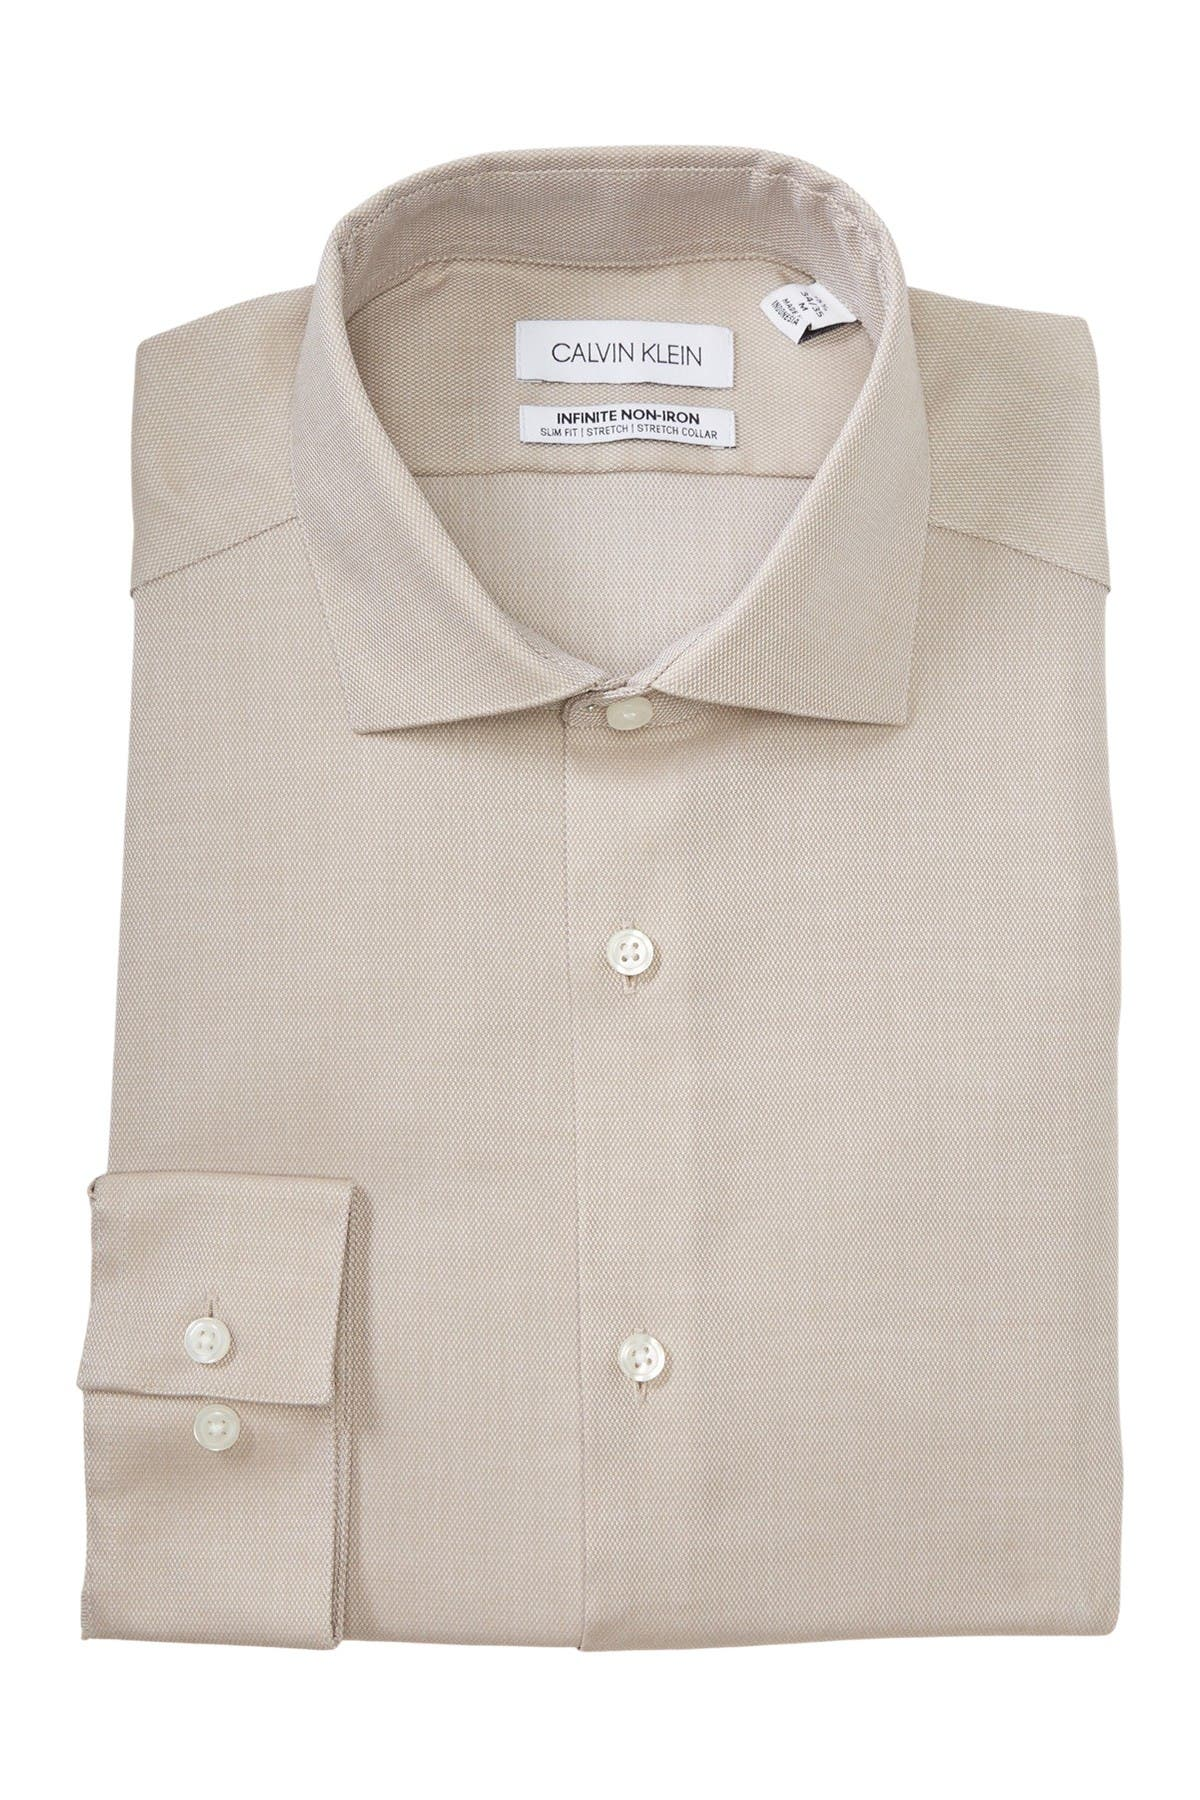 Image of Calvin Klein Infinite Non-Iron Slim Fit Dress Shirt